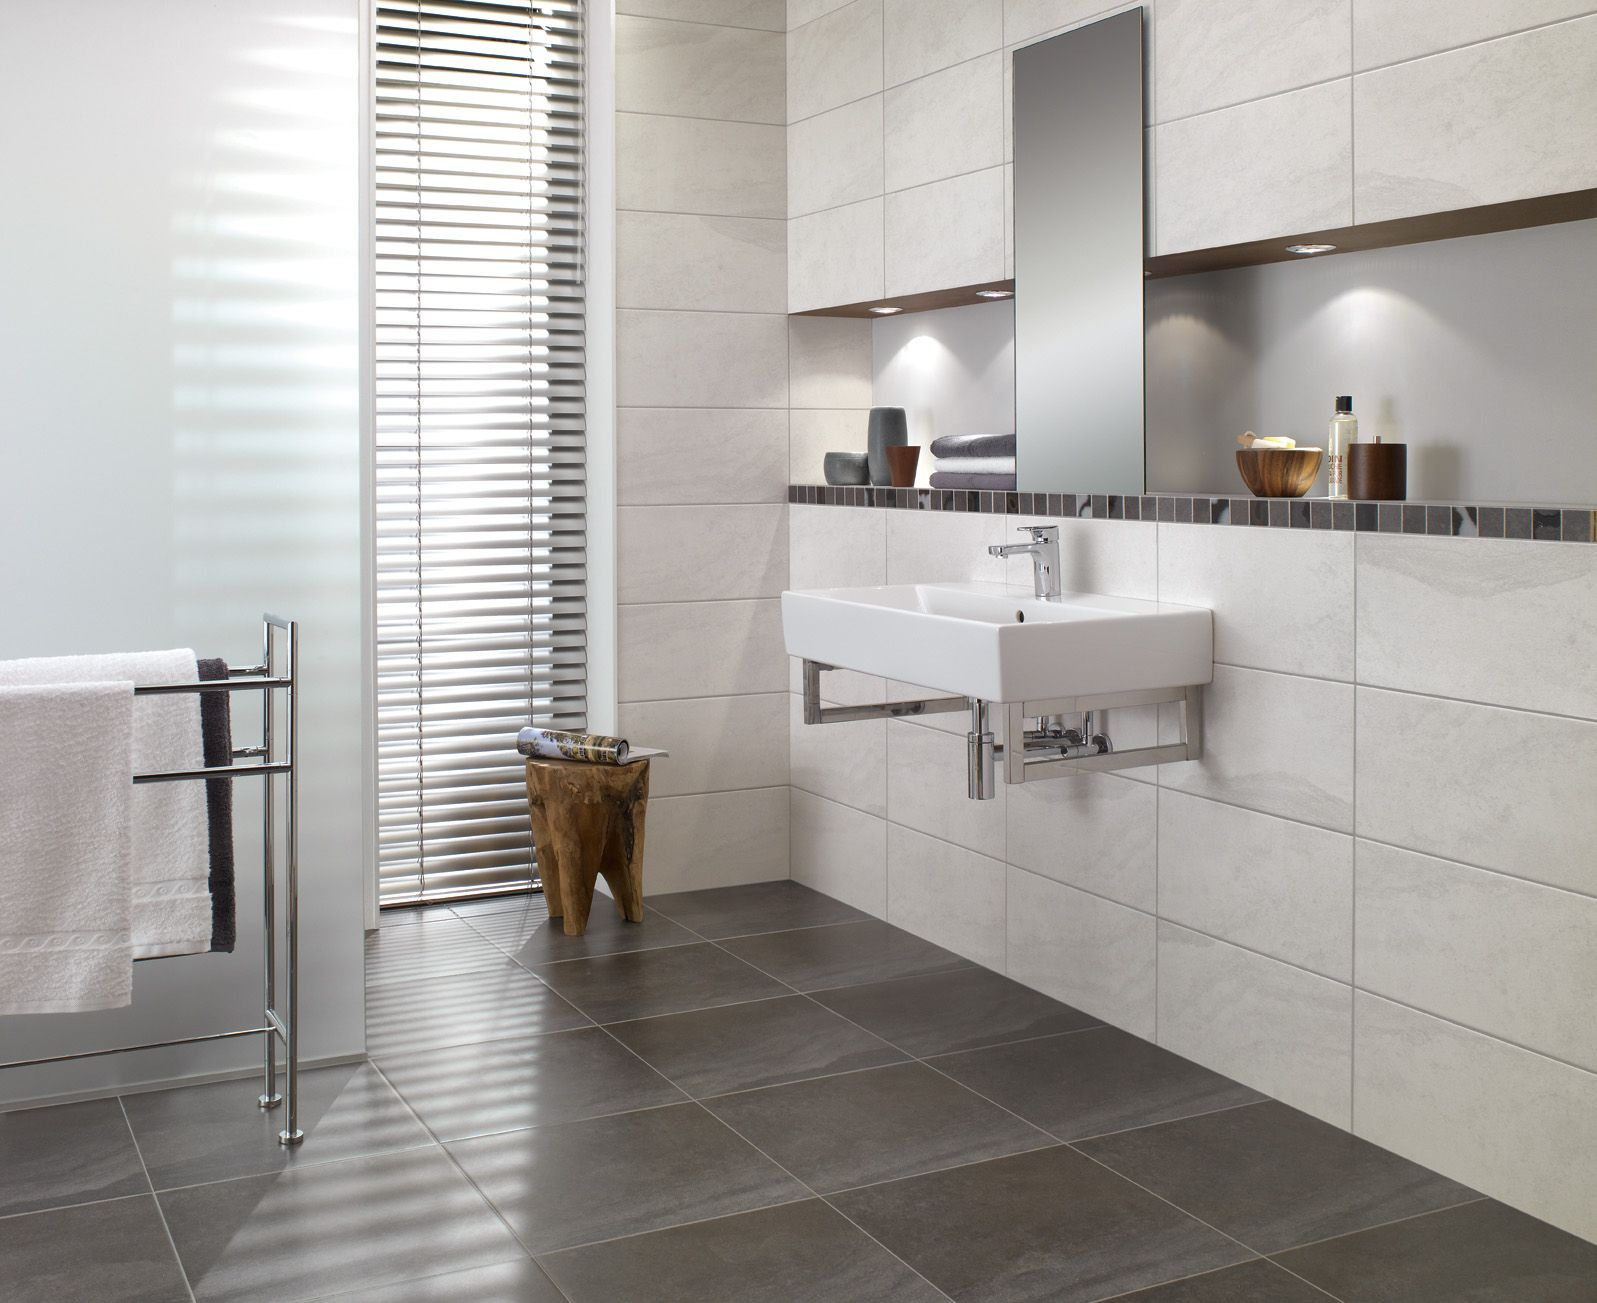 Moderne Badkamers Bathroom Tile Designs Bathroom Tiles Images Beautiful Tile Bathroom